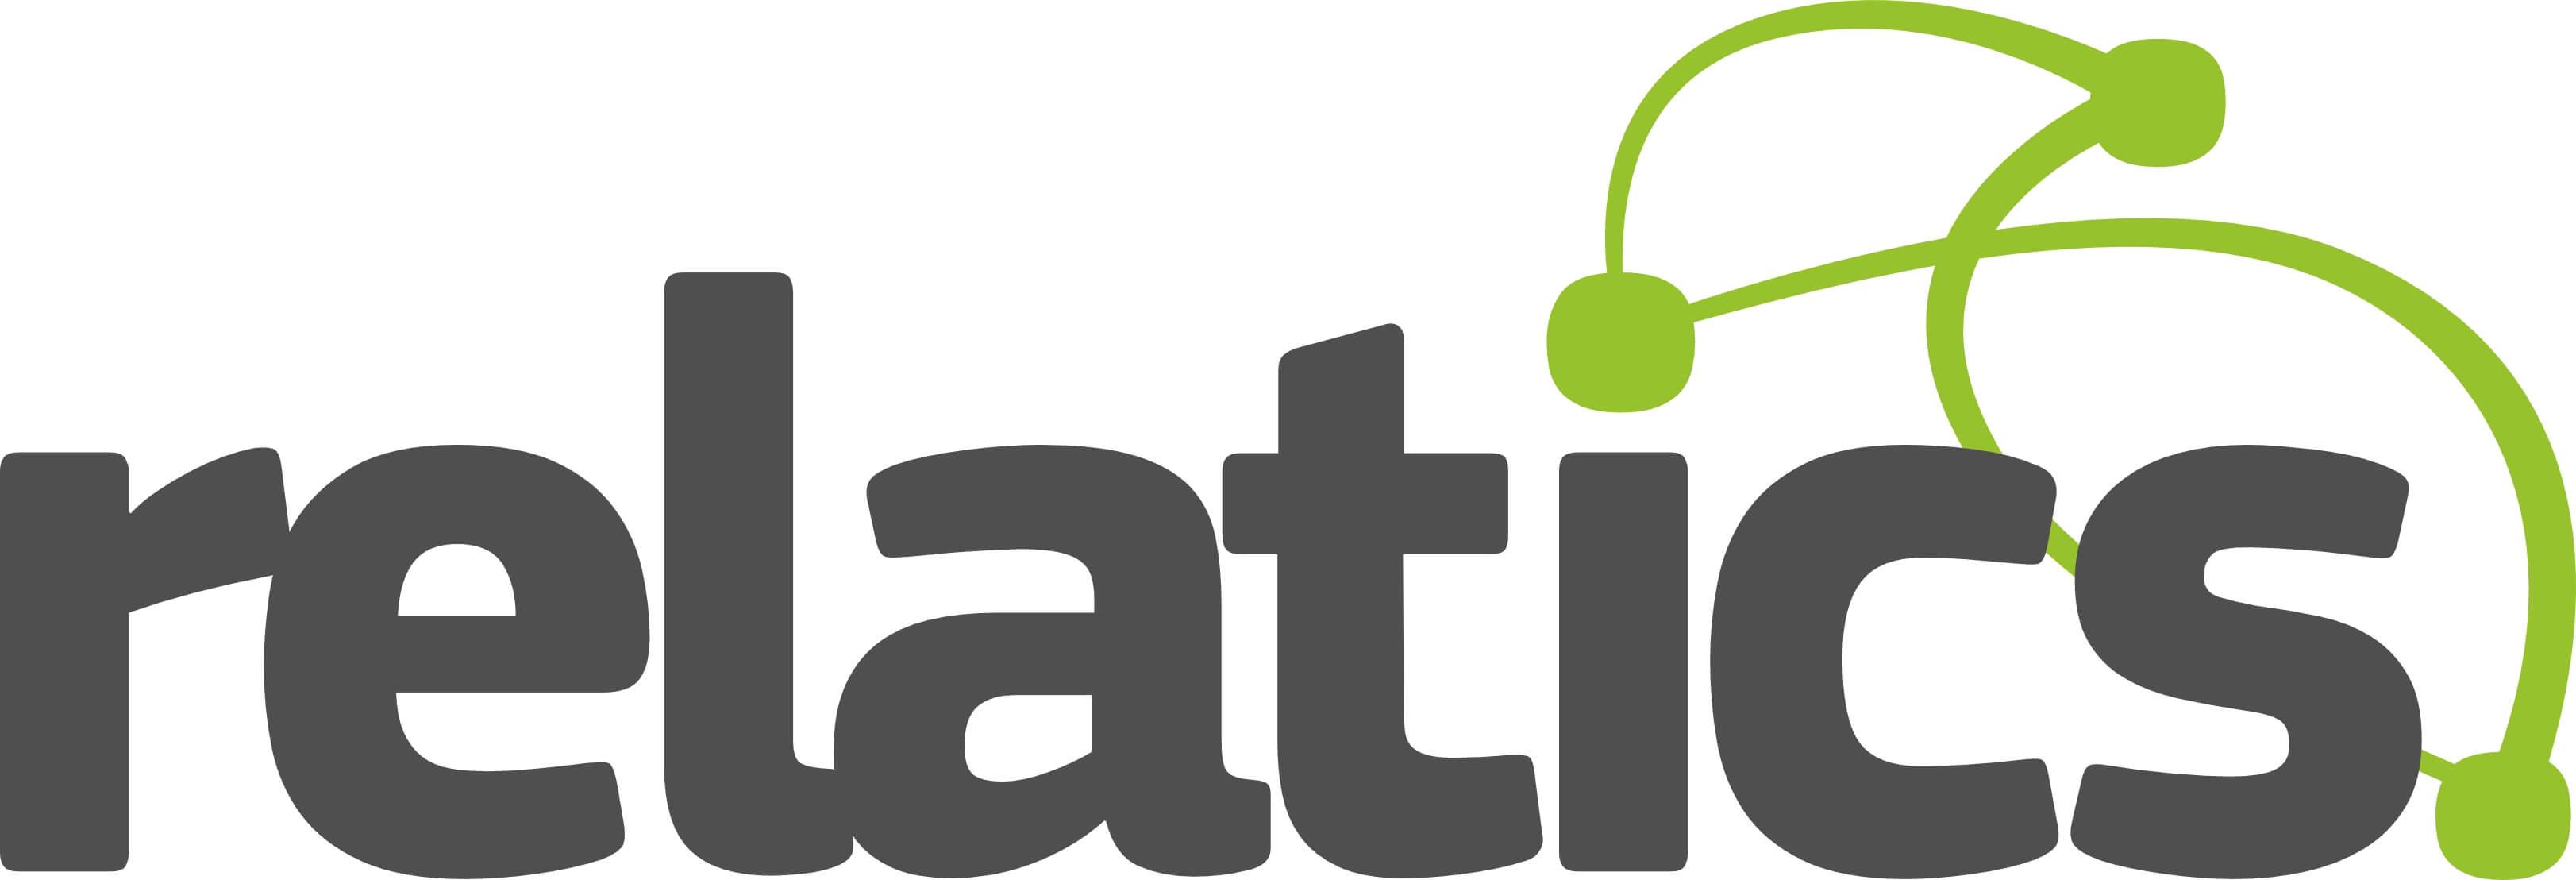 relatics-logo